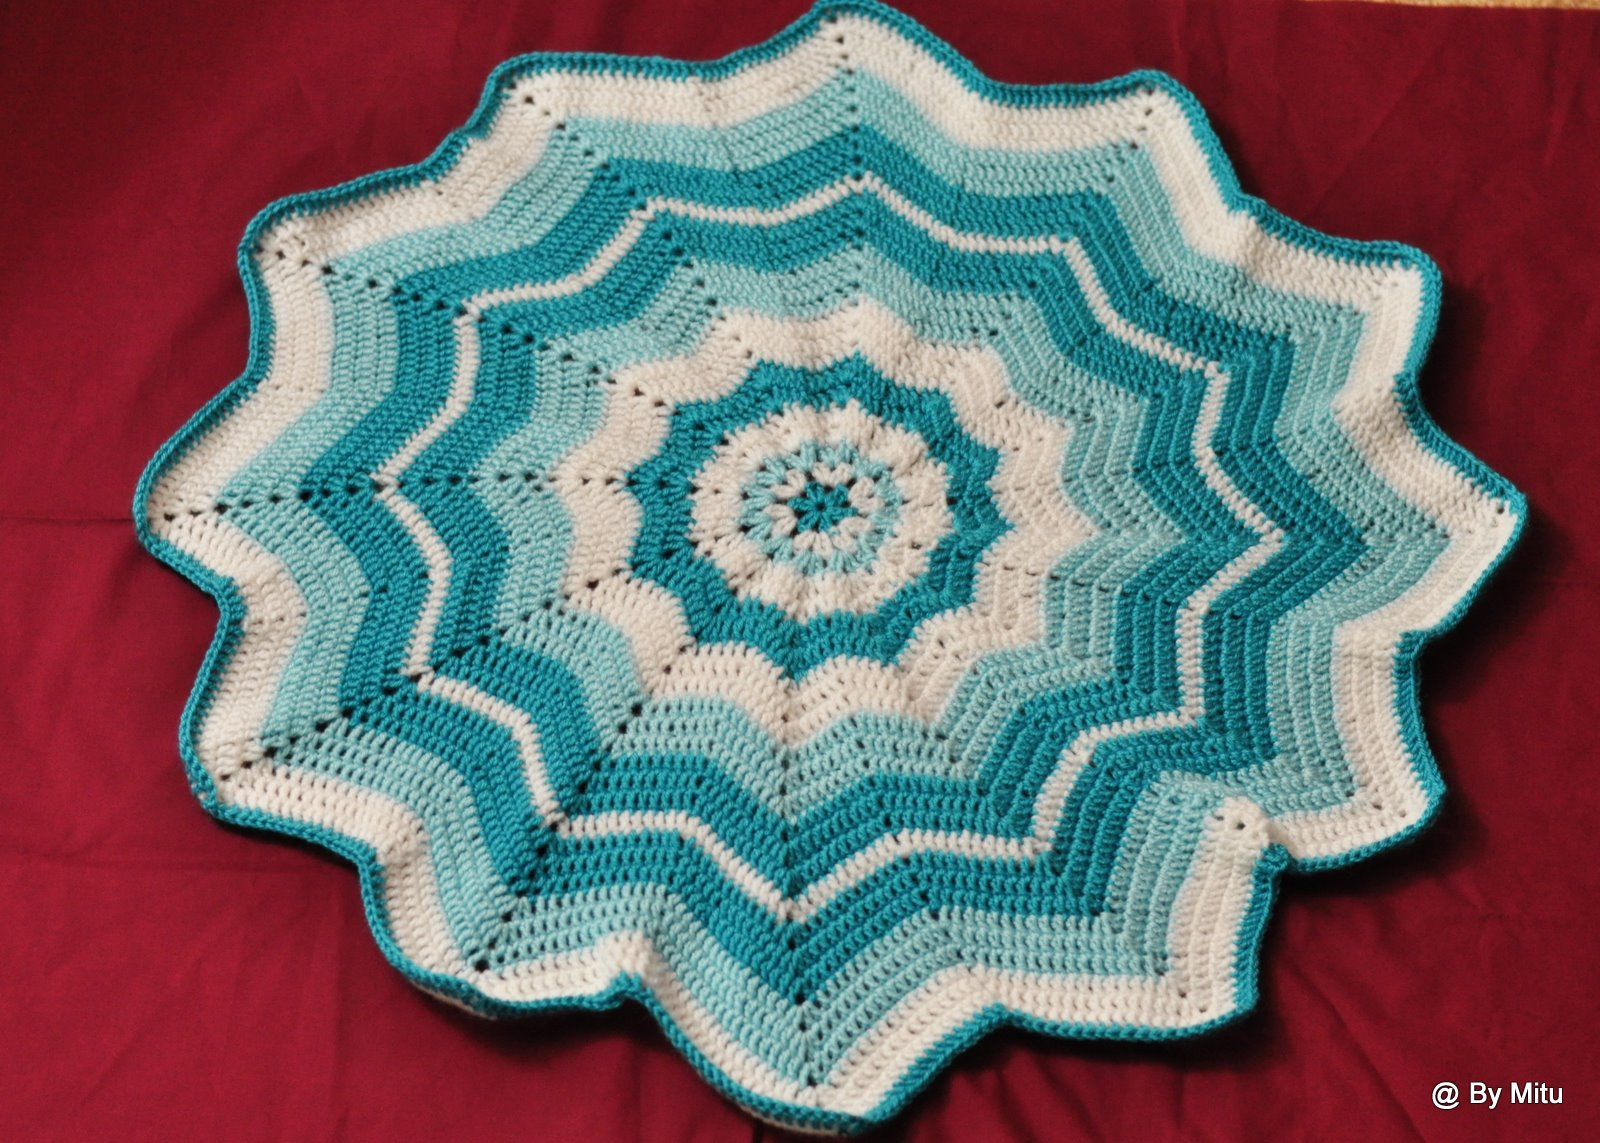 Fashionable Poncho - AllFreeCrochet.com - Free Crochet Patterns